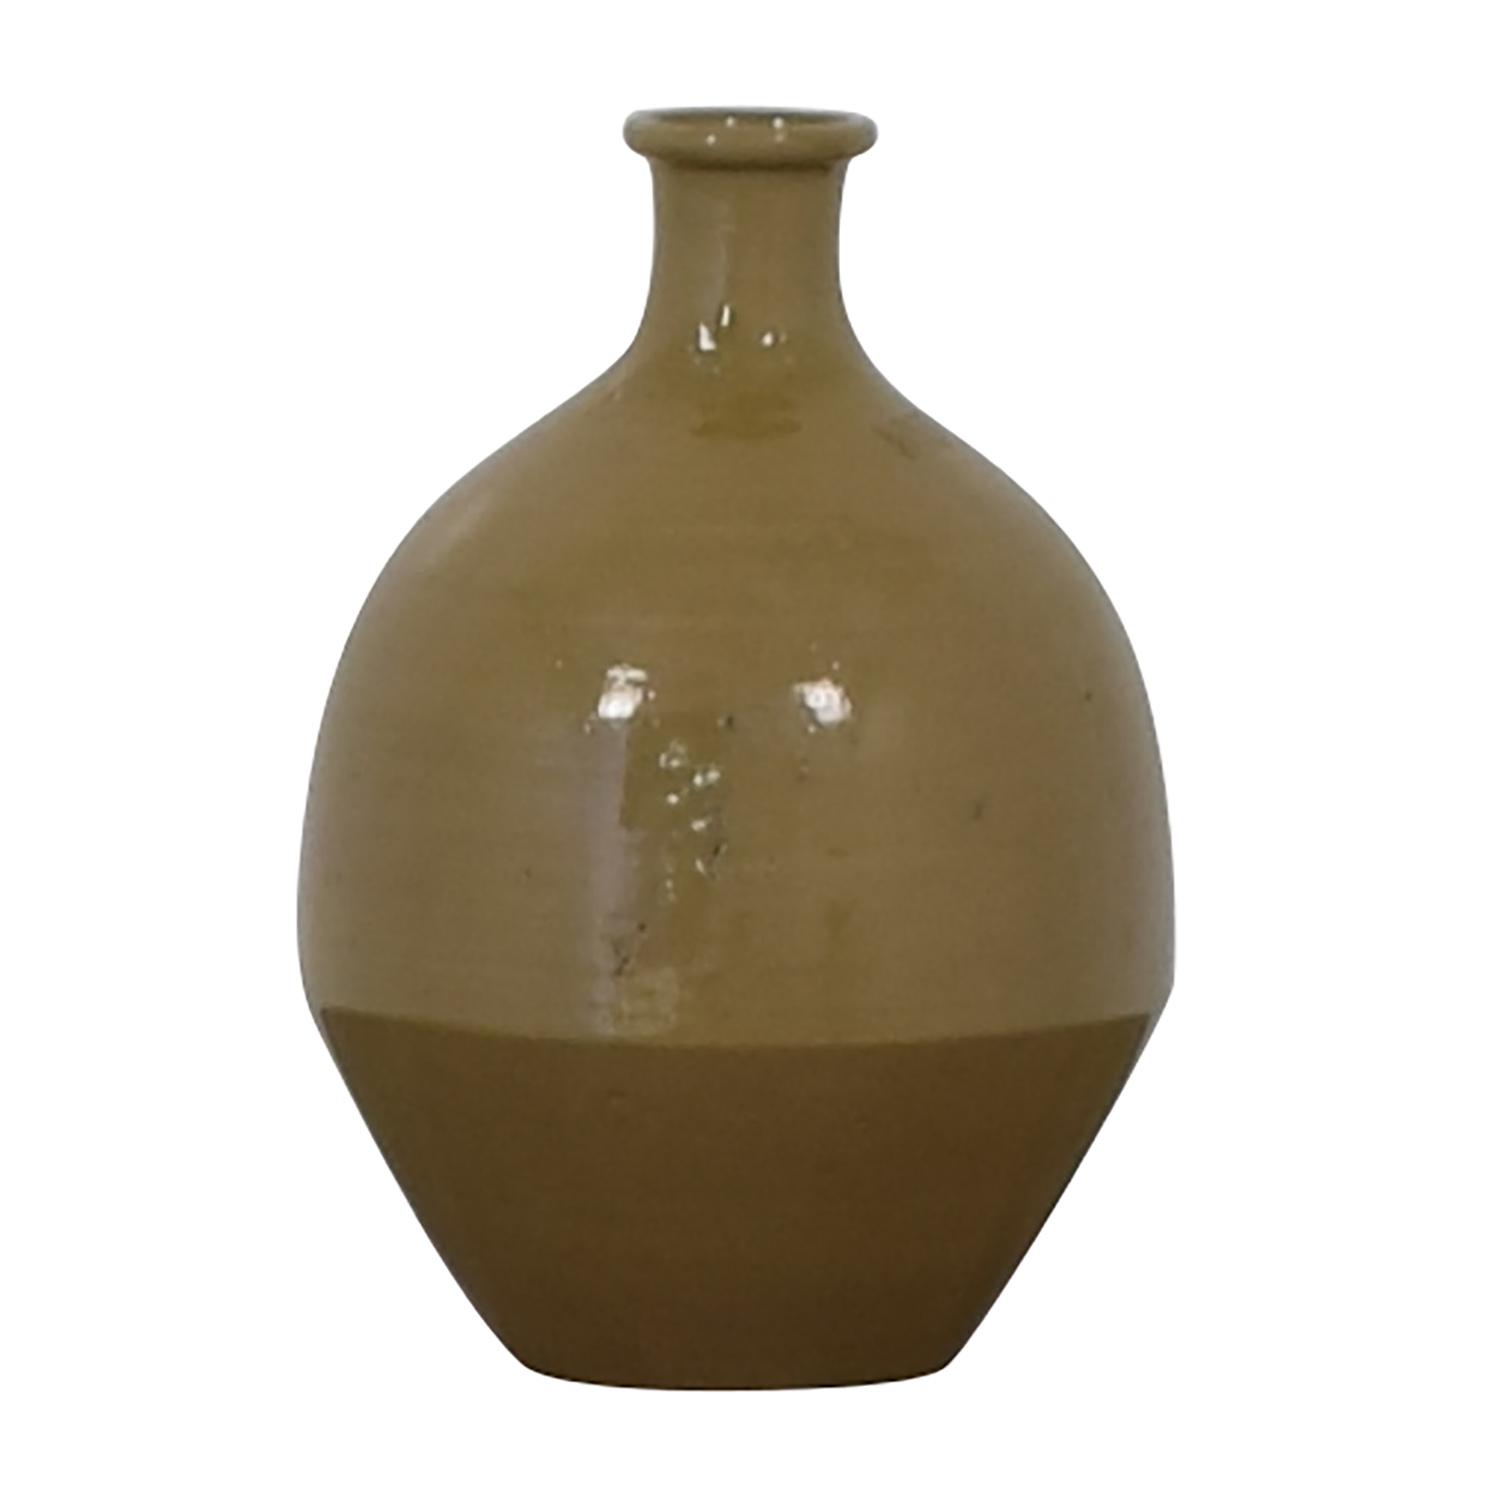 Pottery Barn Beige Ceramic Vase / Decorative Accents